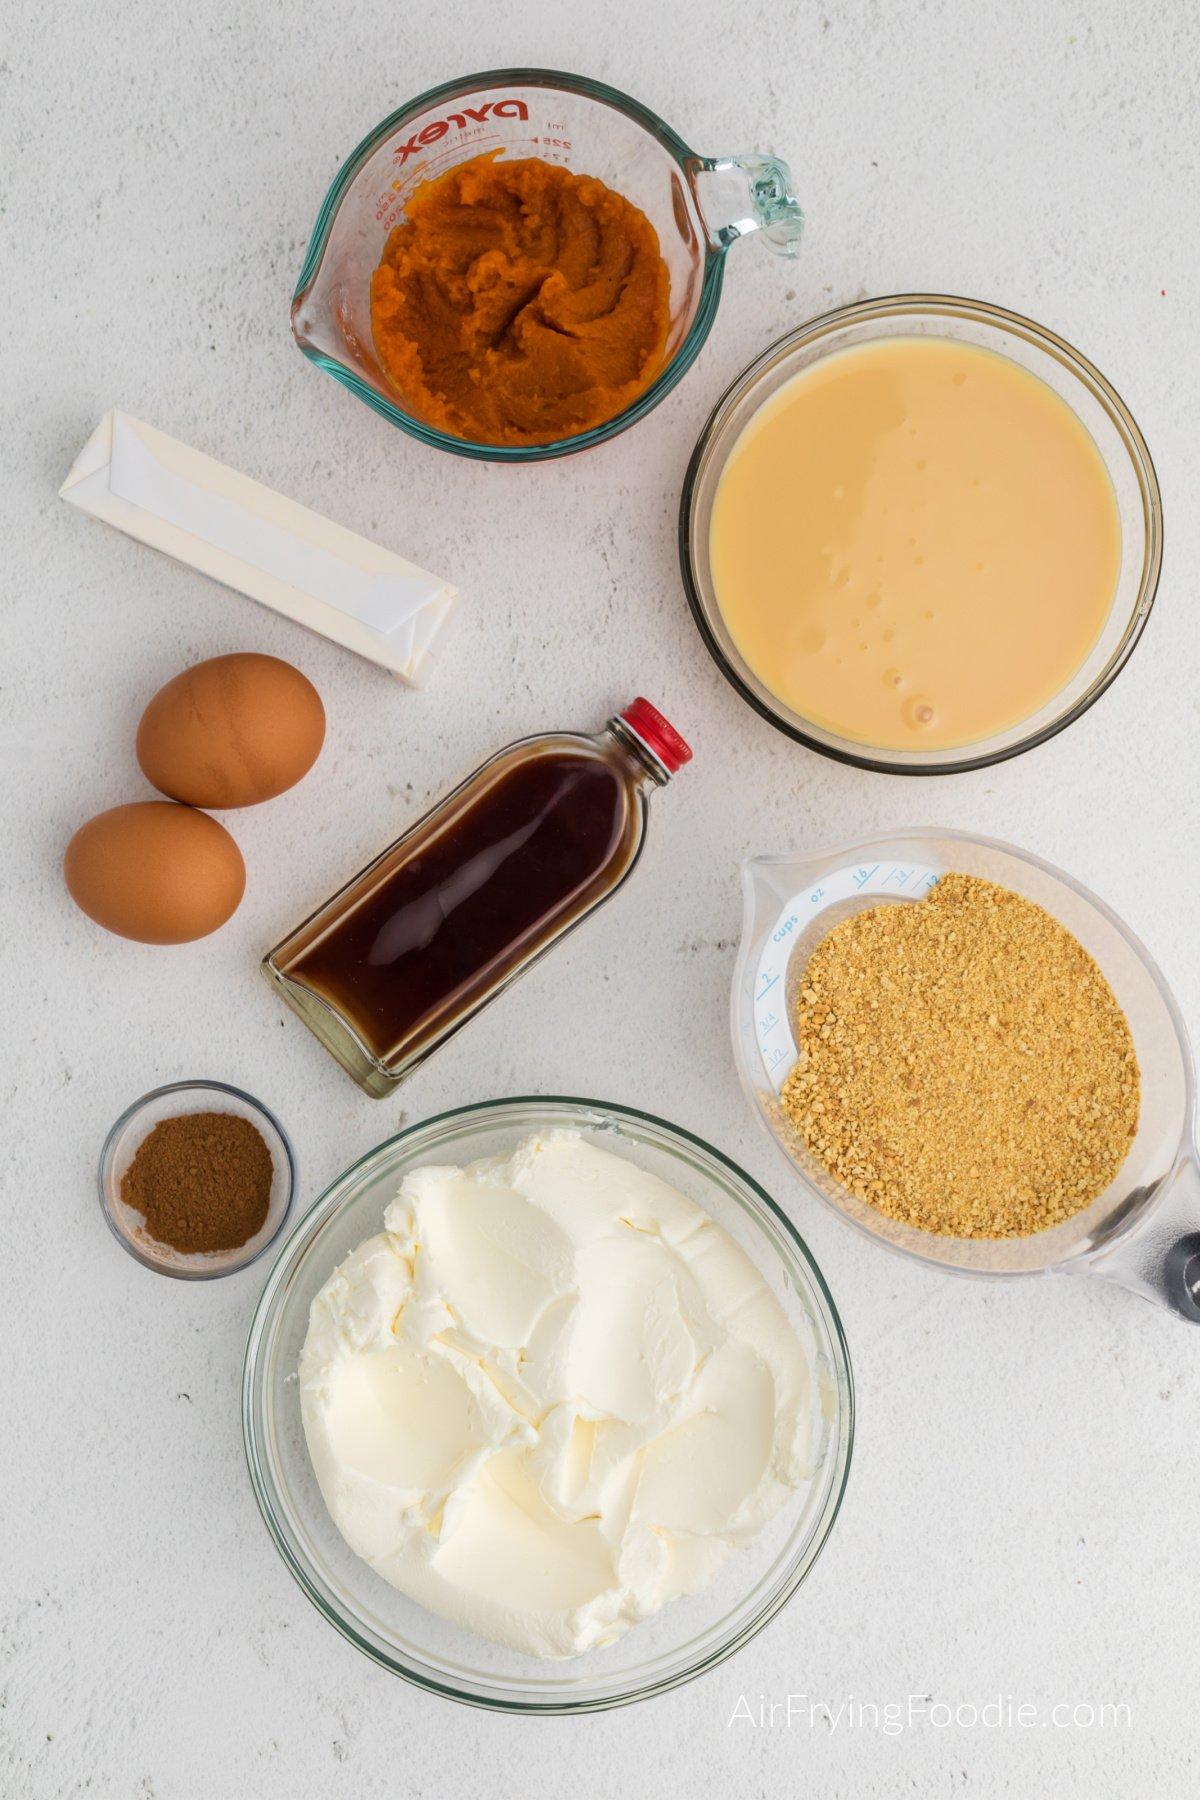 Ingredients needed to make pumpkin cheesecake in the air fryer.